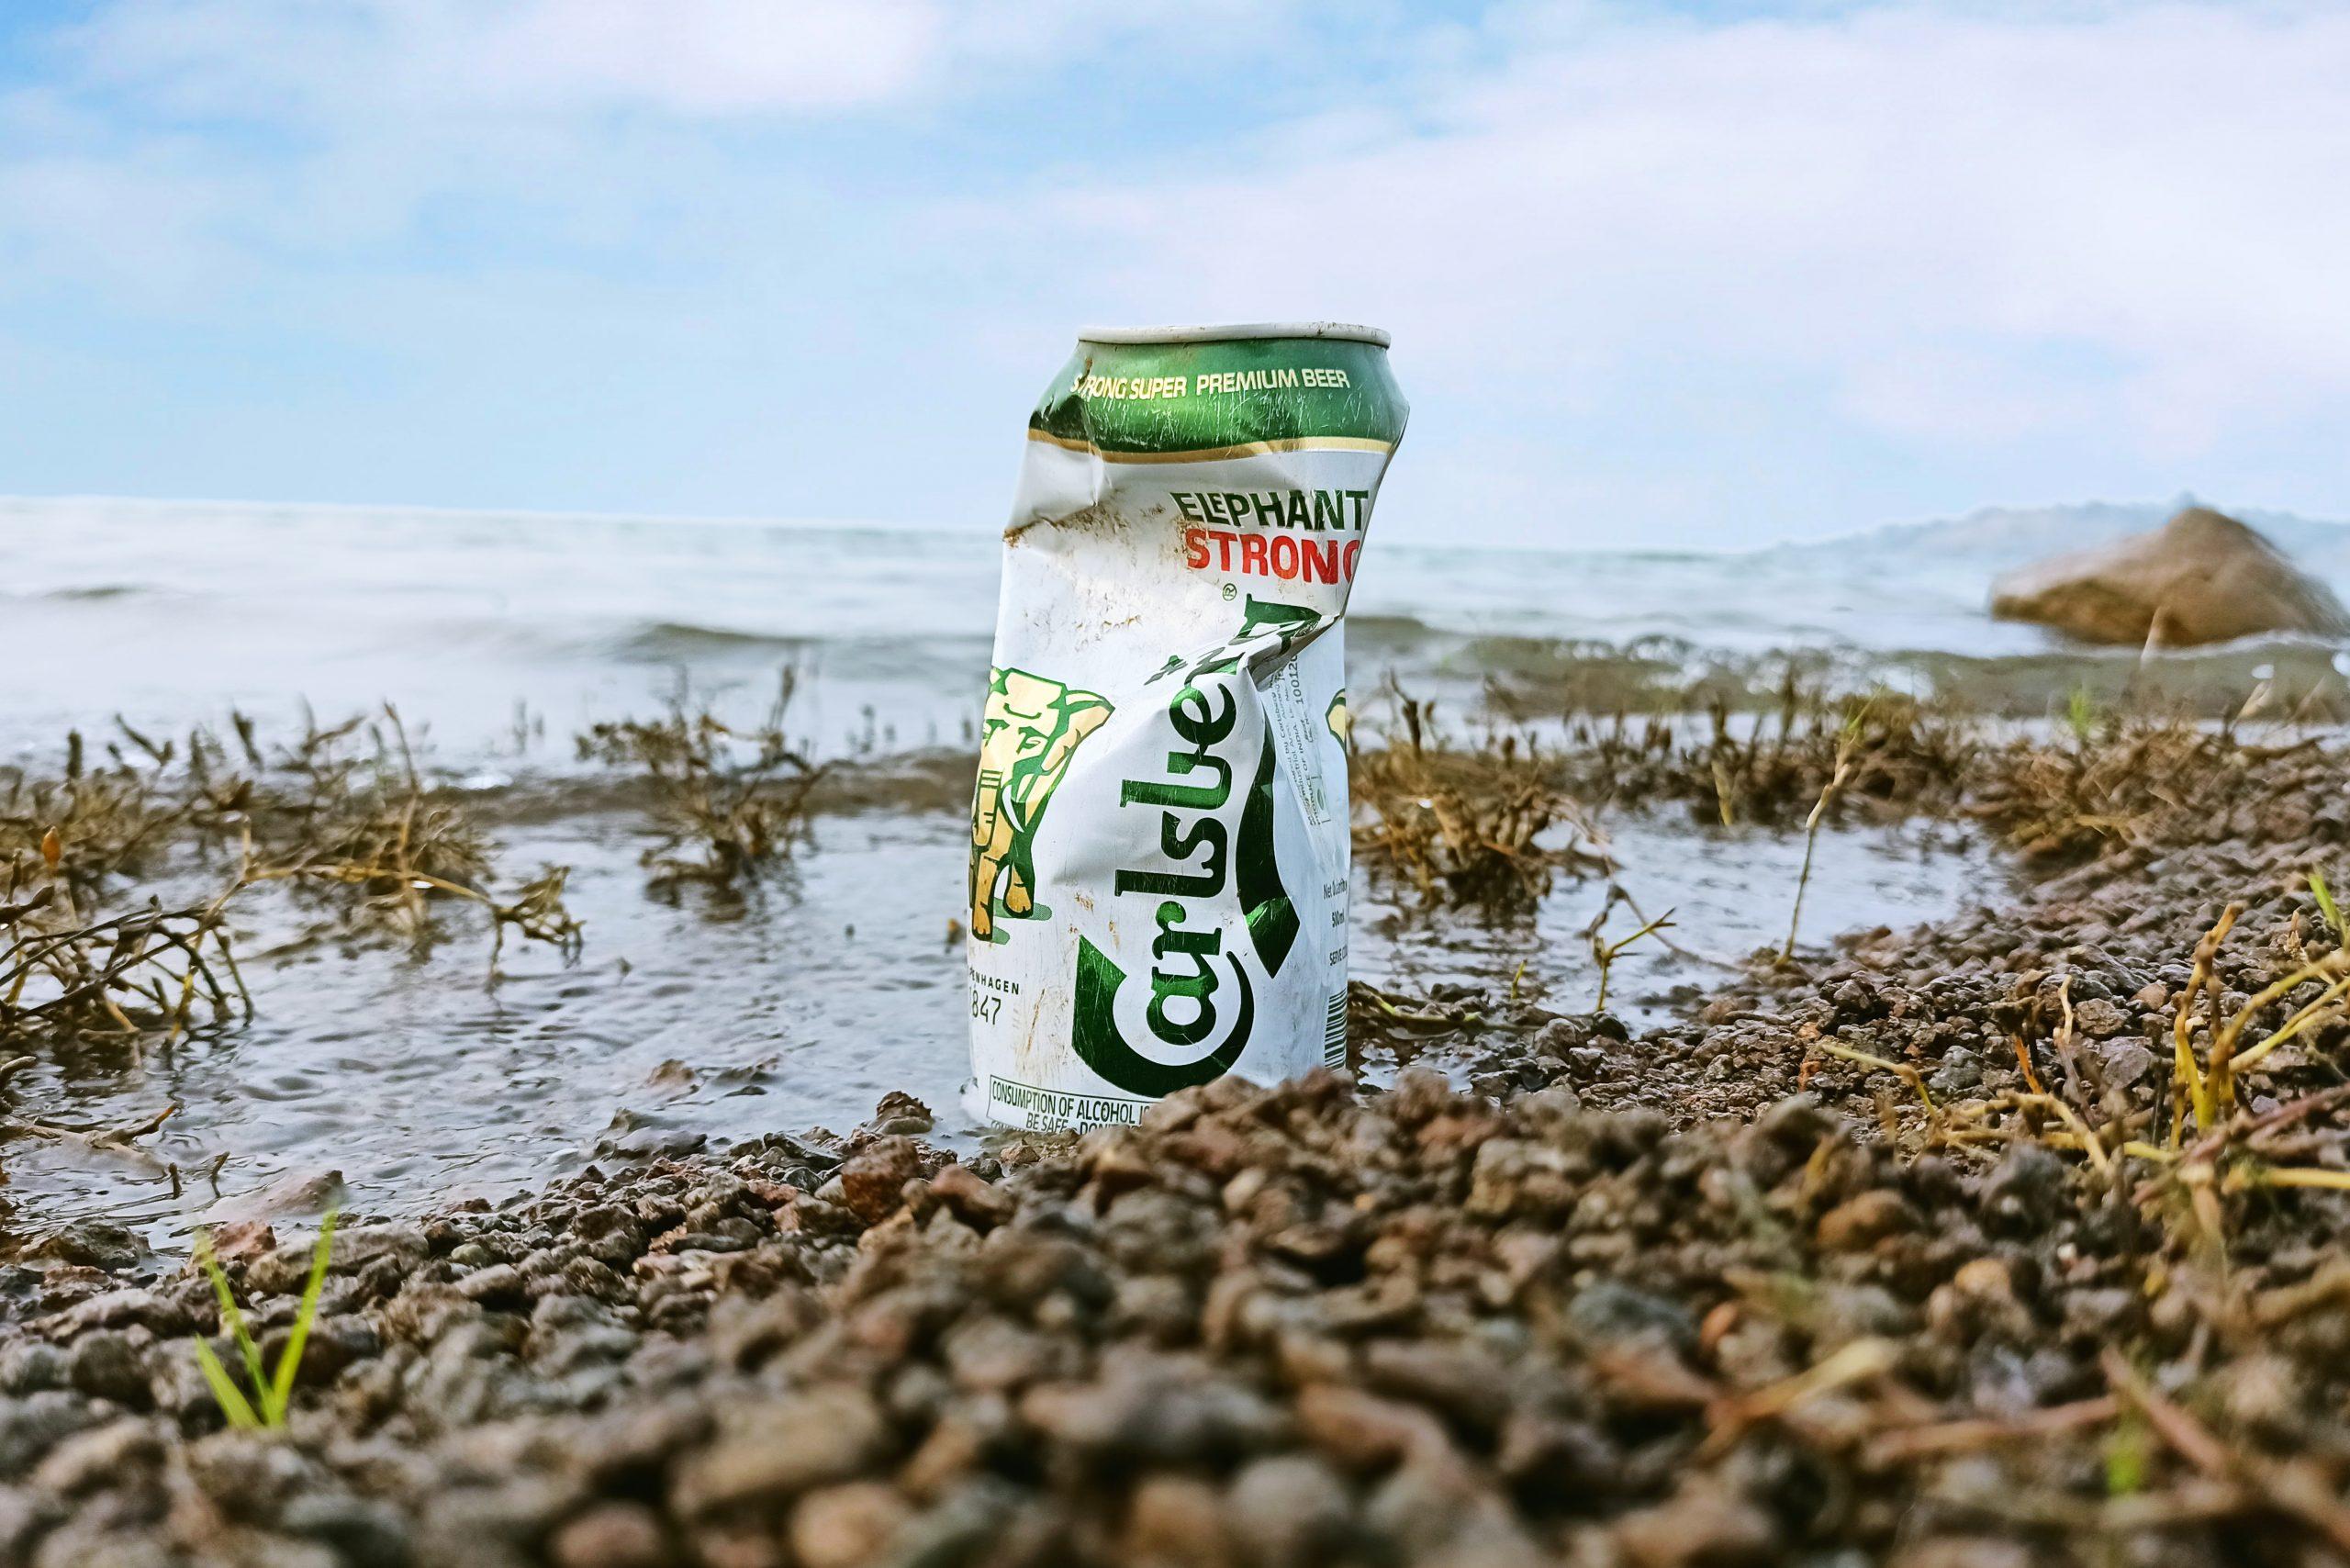 Carlsberg elephant beer cane on beach